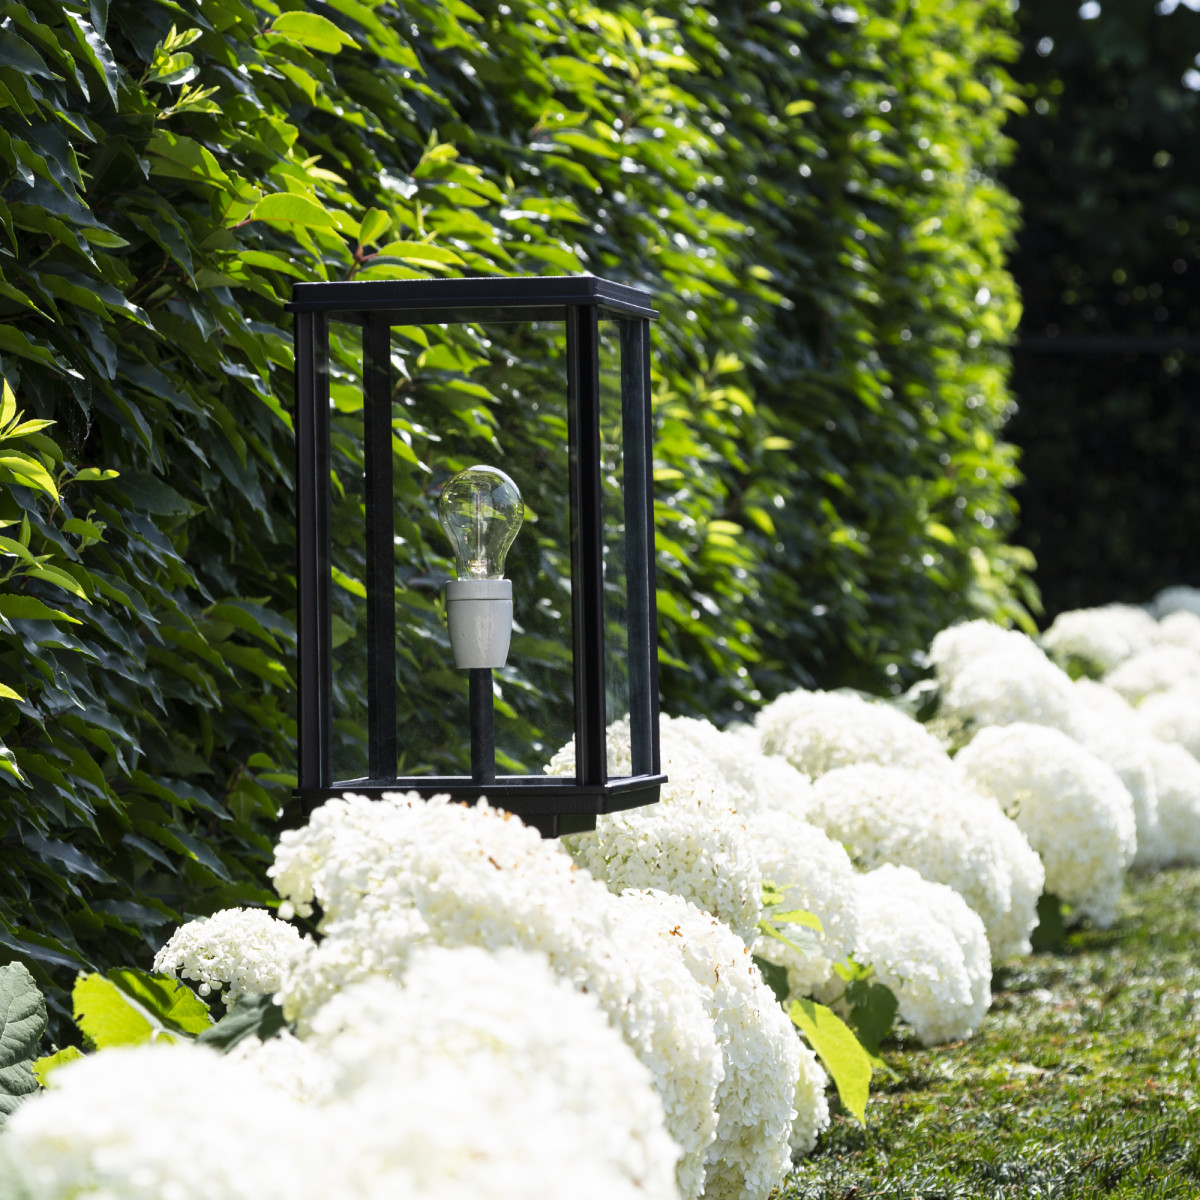 Buitenverlichting tuinlamp Capital terras XL van KS Verlichting, strak klassieke tuinverlichting, terraslantaarn